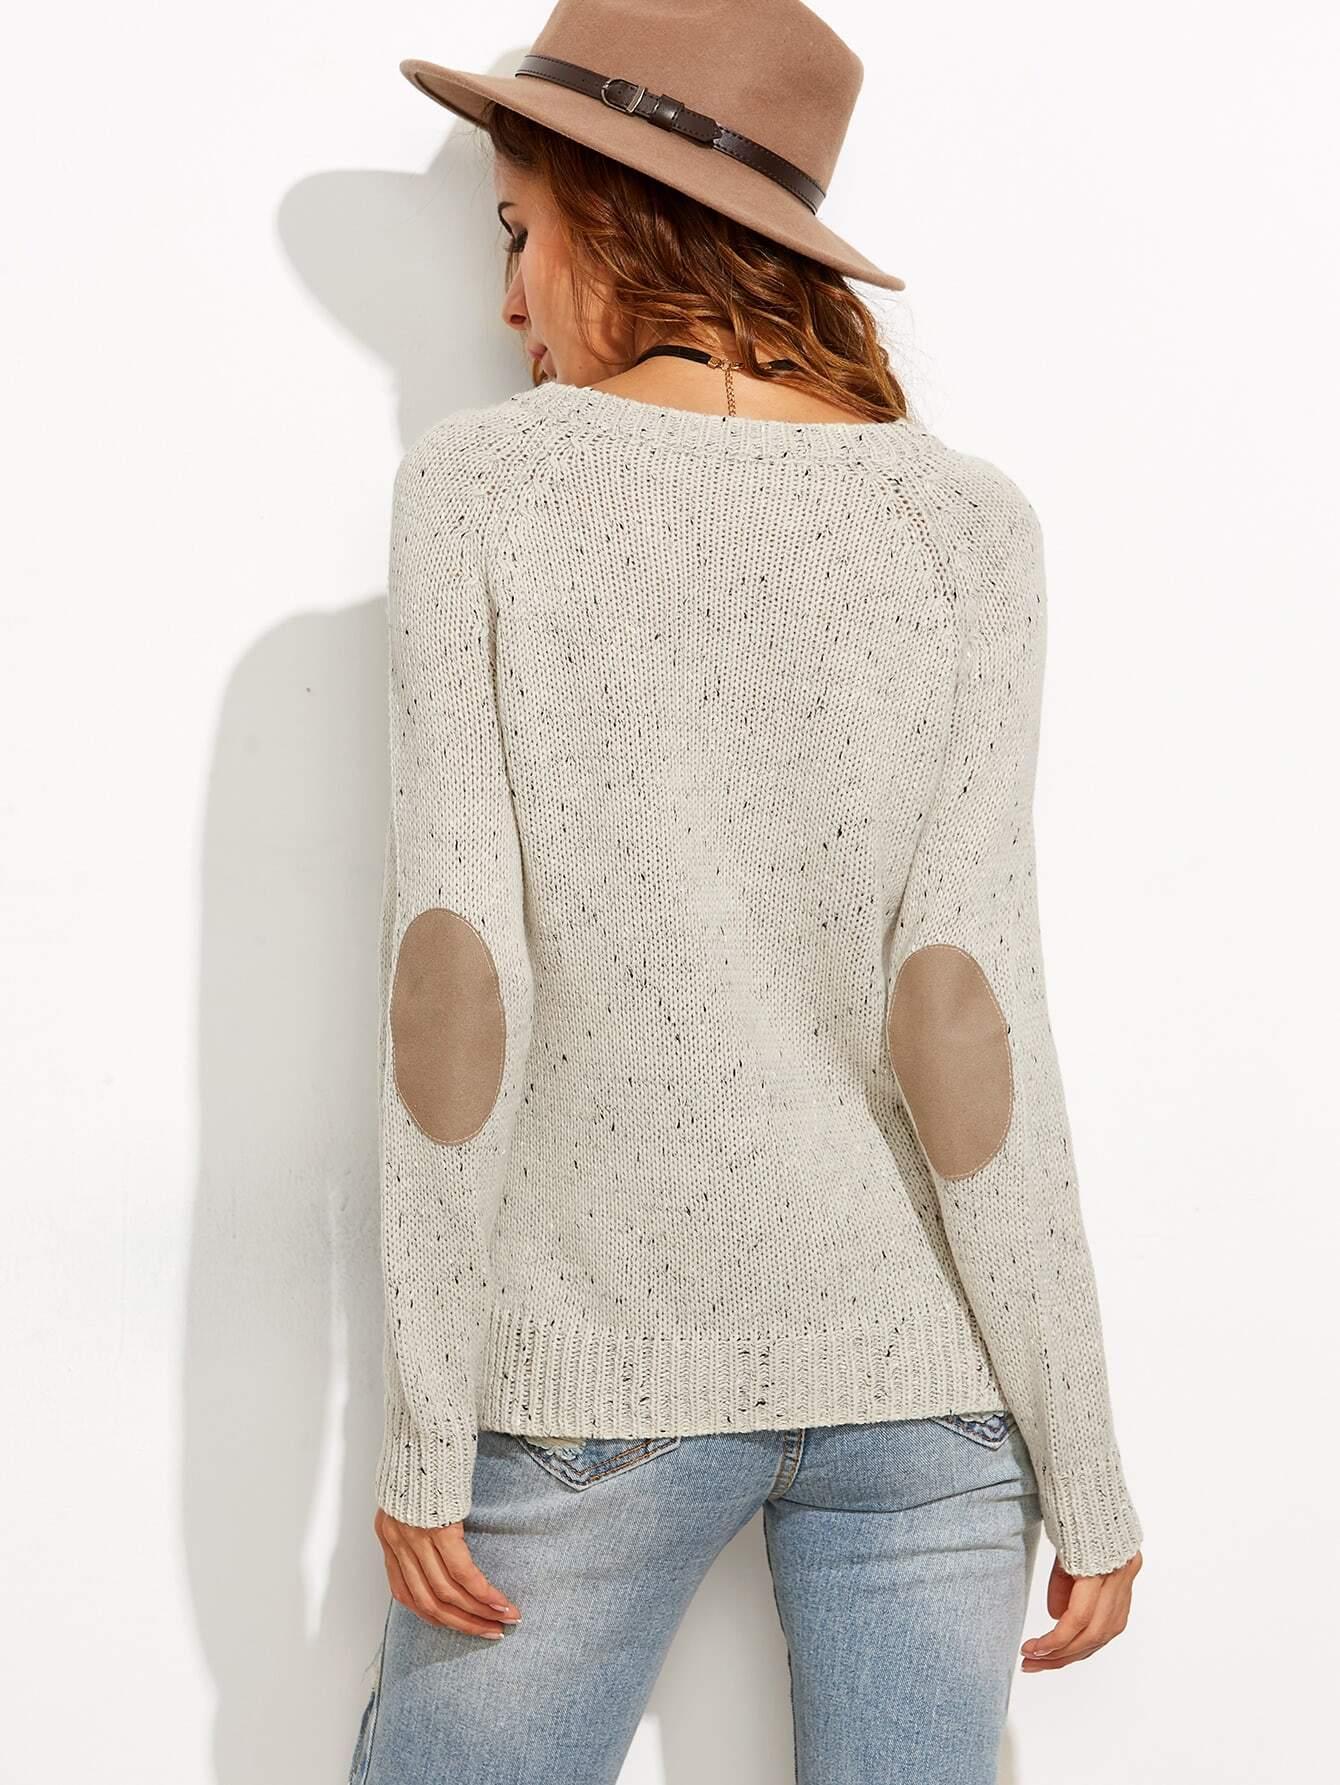 sweater160810701_2